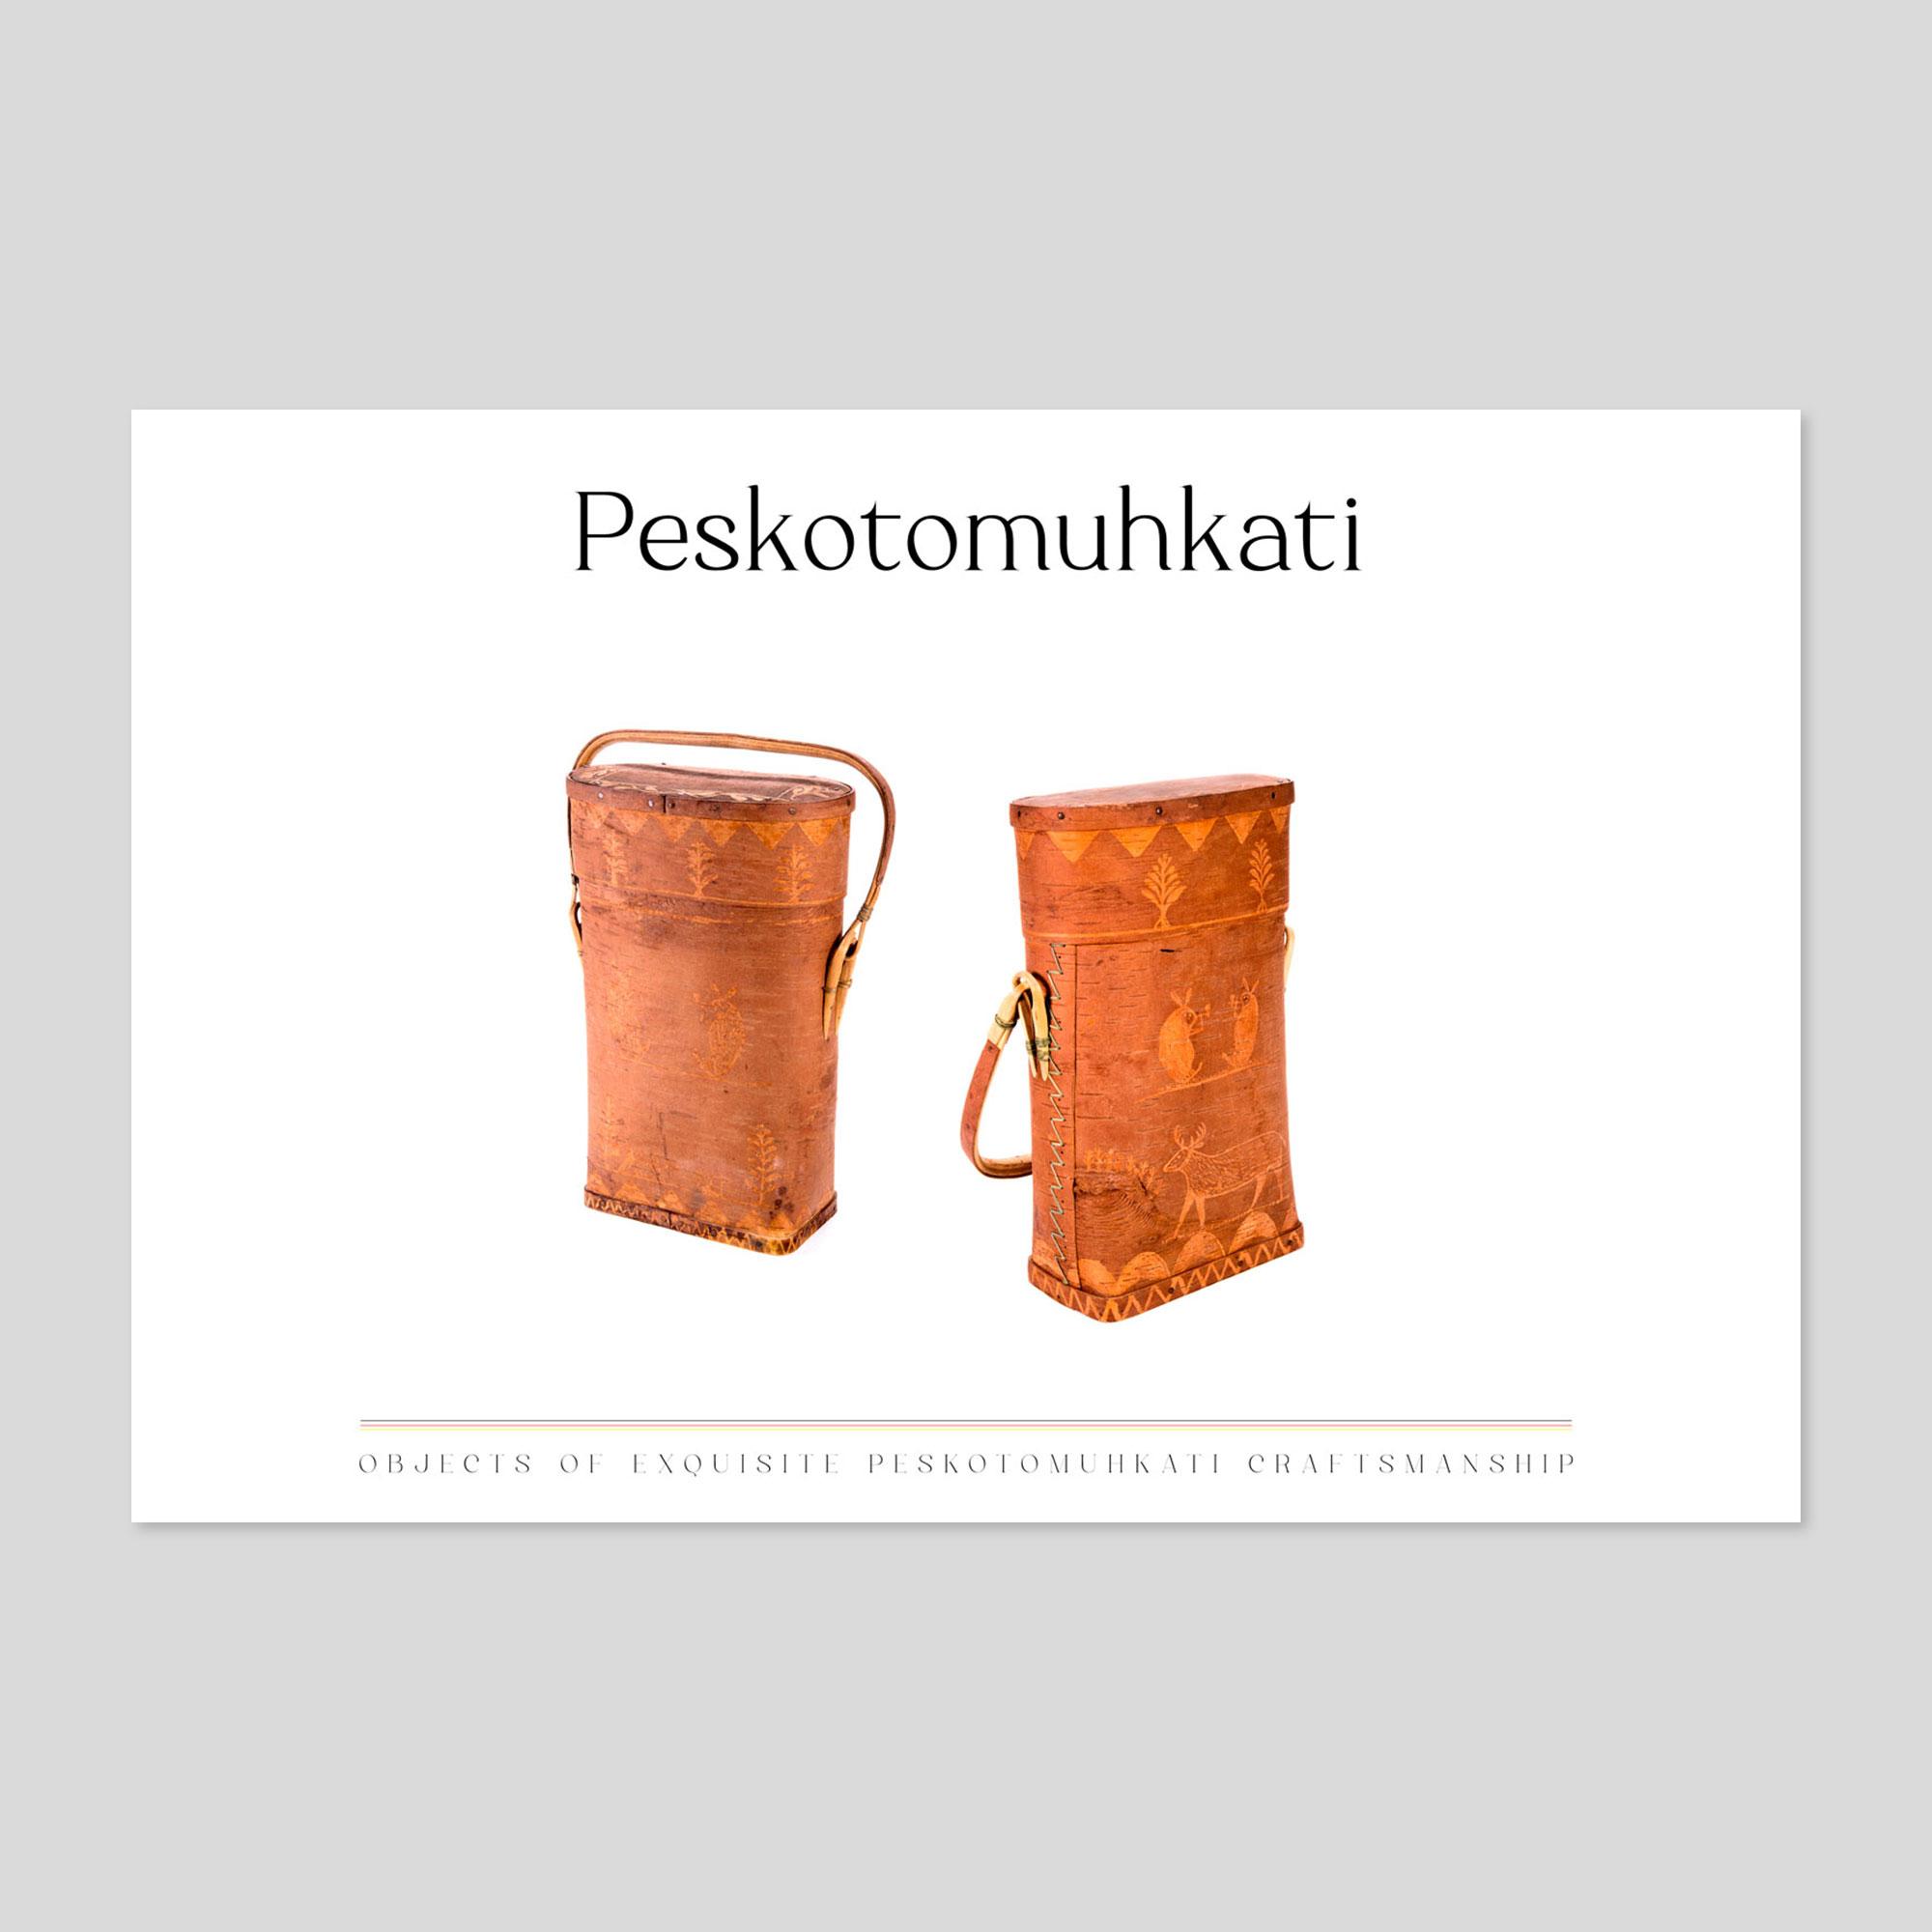 002-peskotomuhkati-birchbark-baskets-masqewi-web